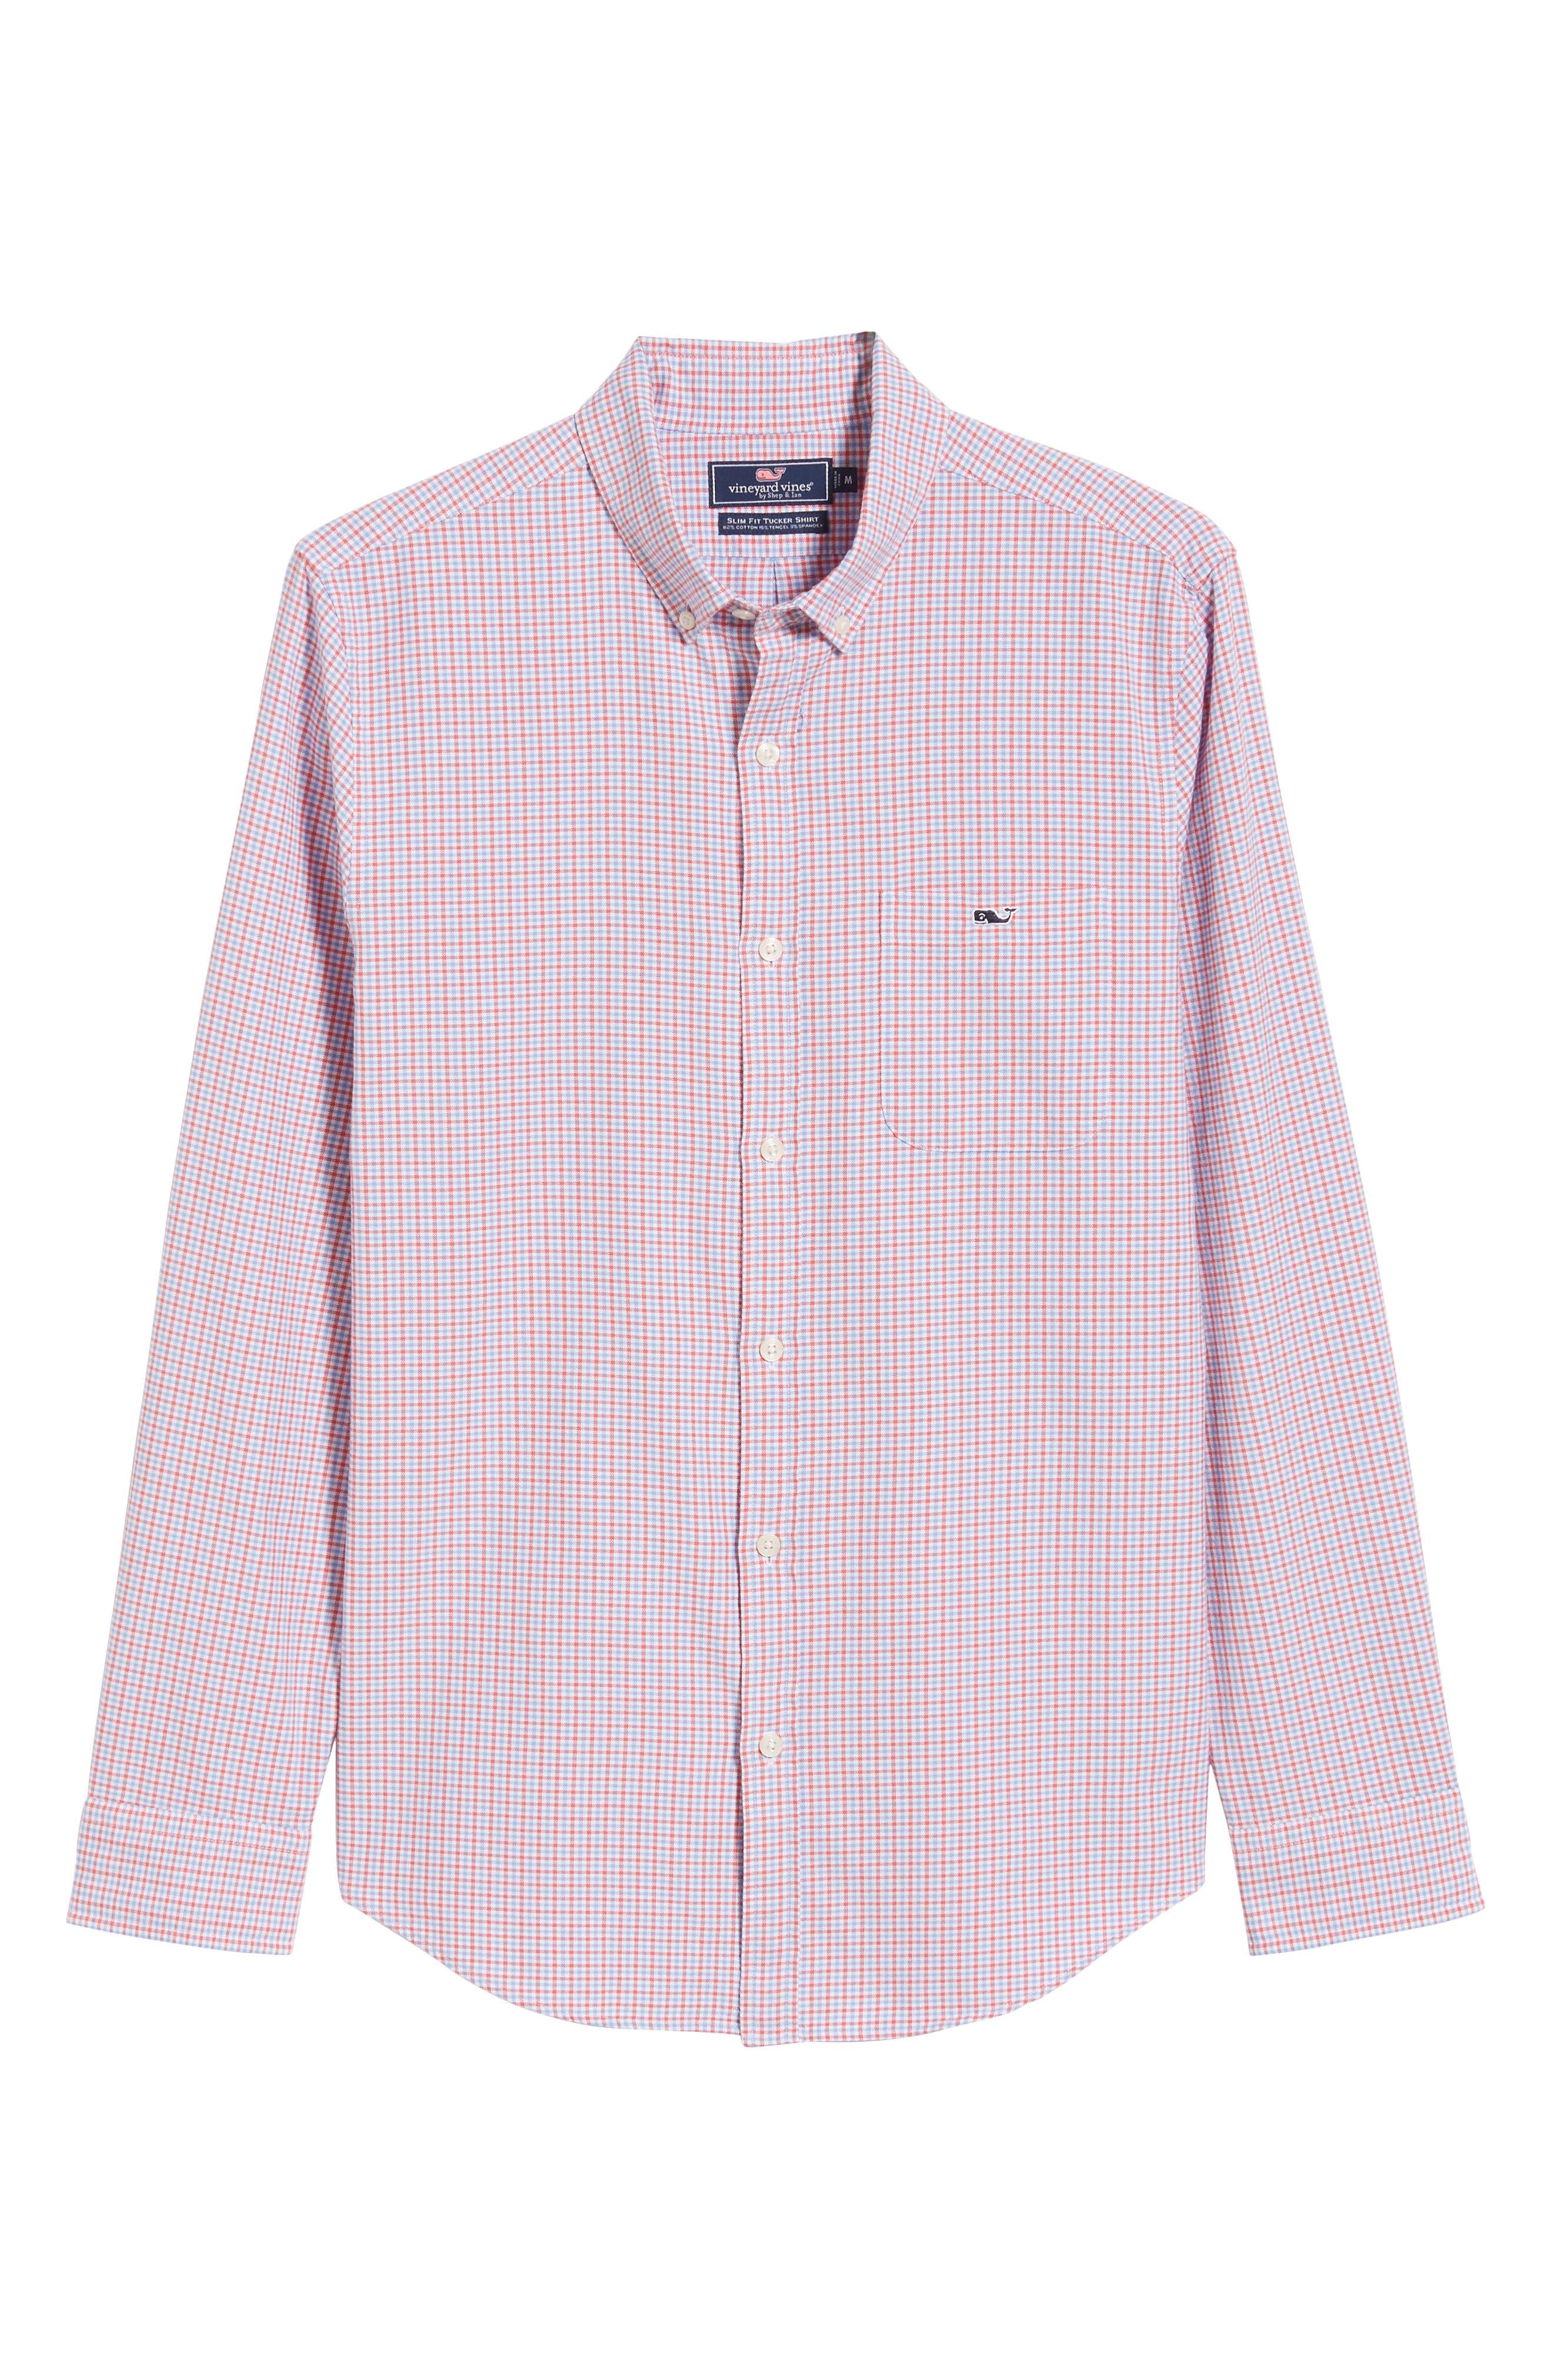 Slim Tucker 2 Check Sport Shirt,                             Alternate thumbnail 5, color,                             SAILORS RED